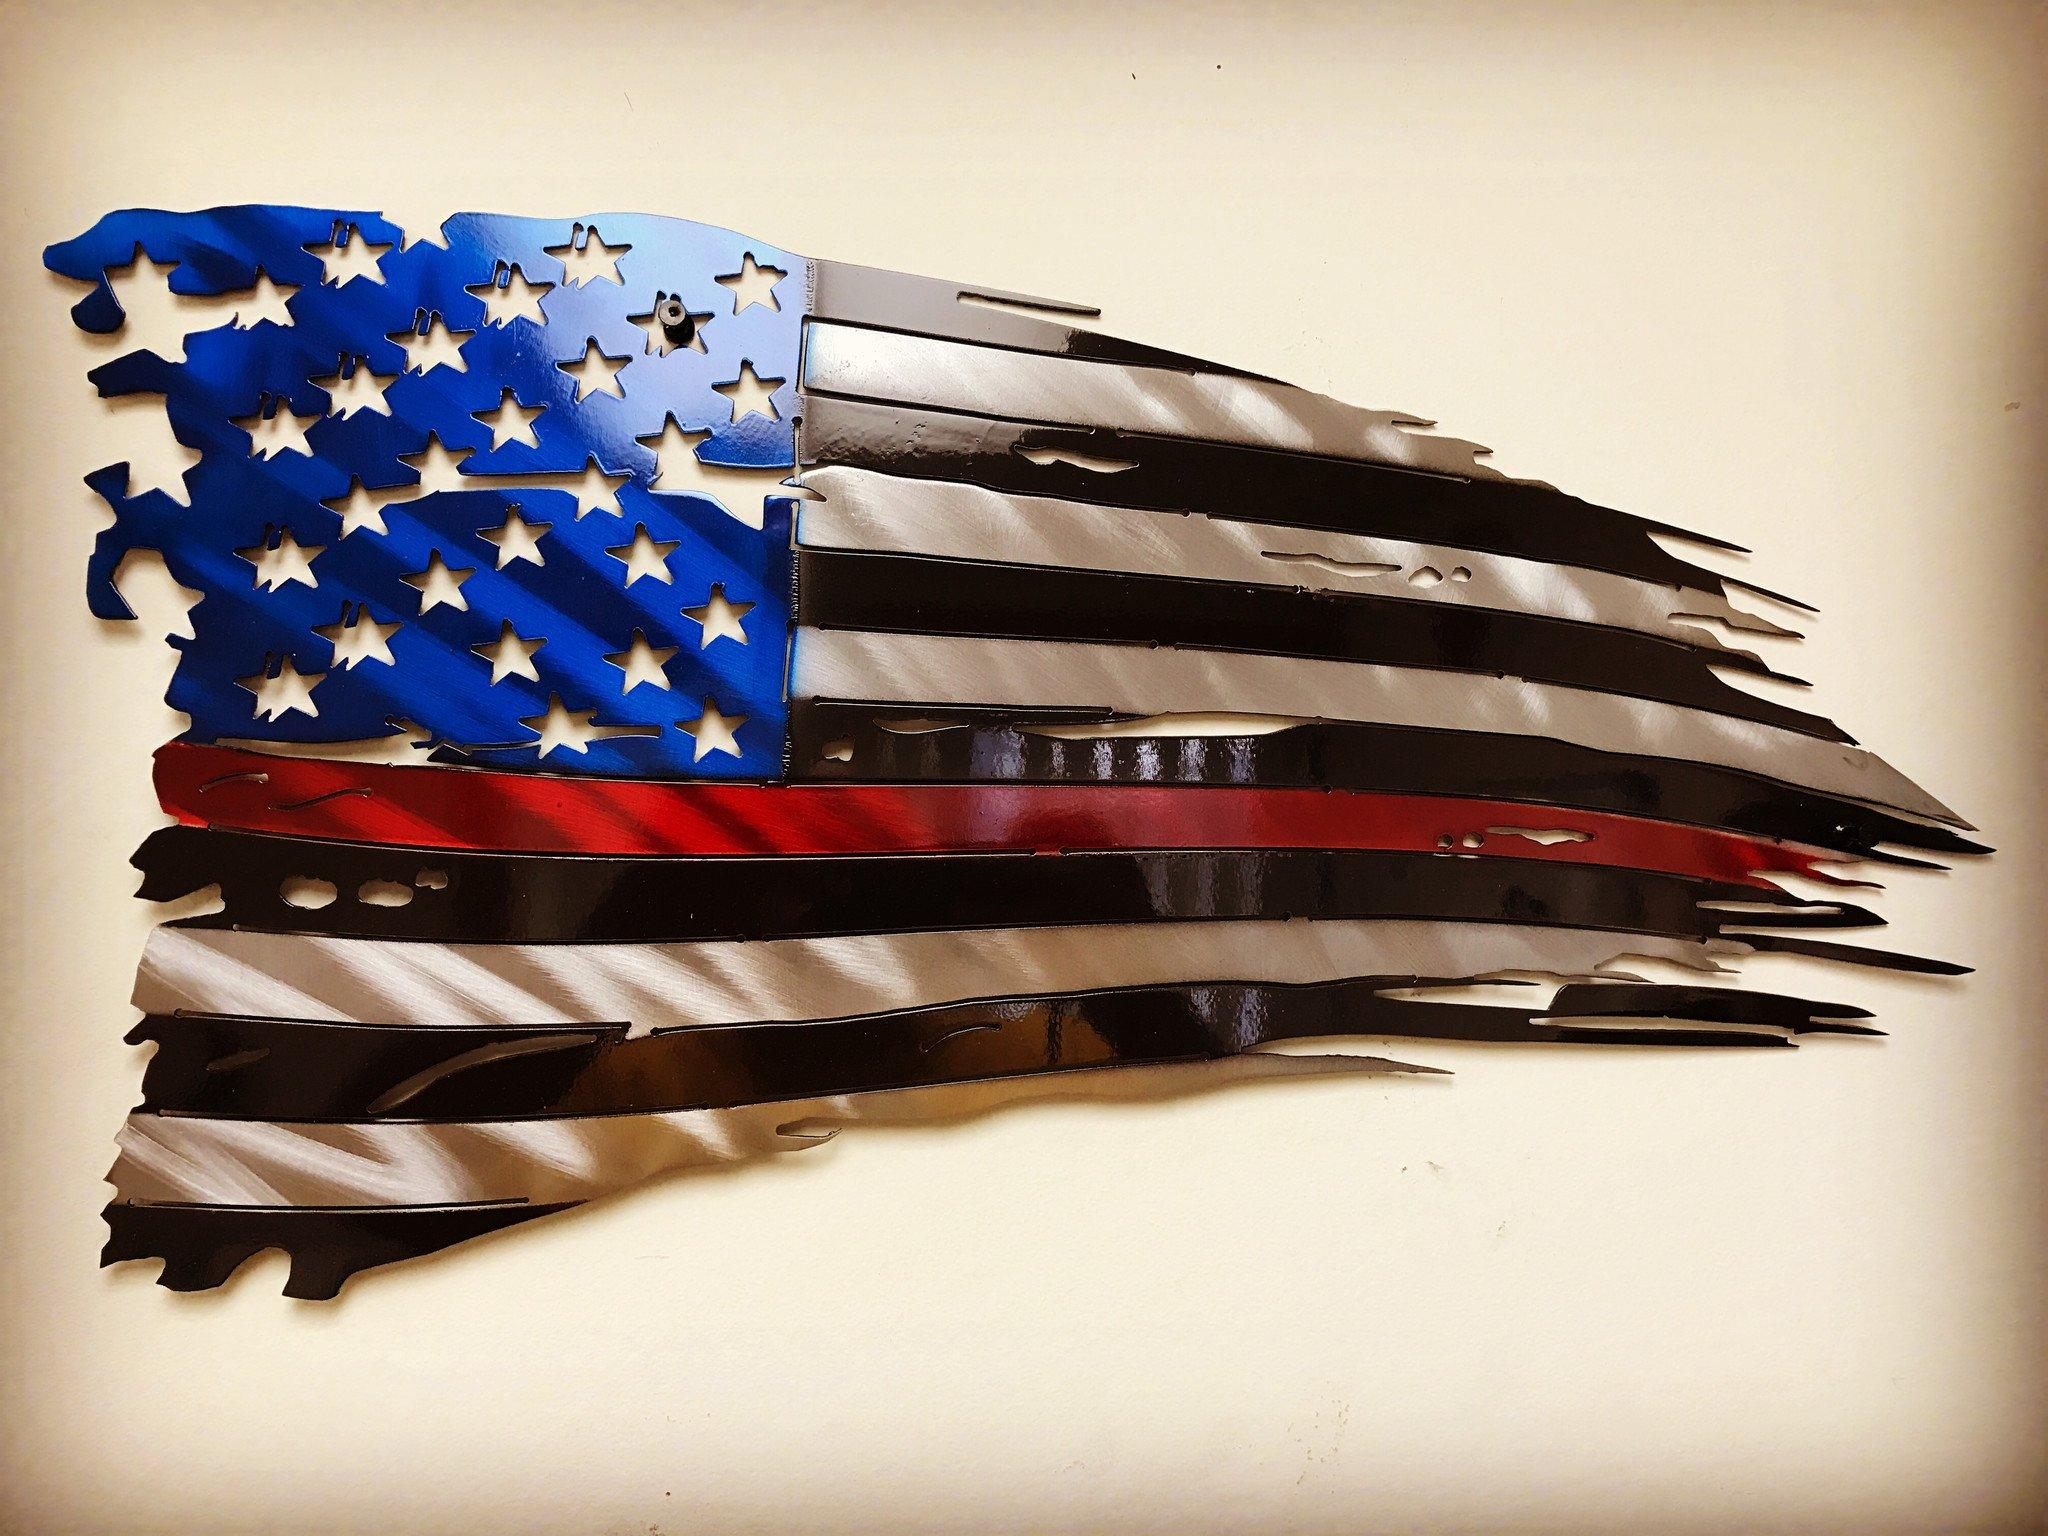 Metal Art of Wisconsin Firefighters Weathered Old Glory Painted American Flag Metal Art 2-Foot